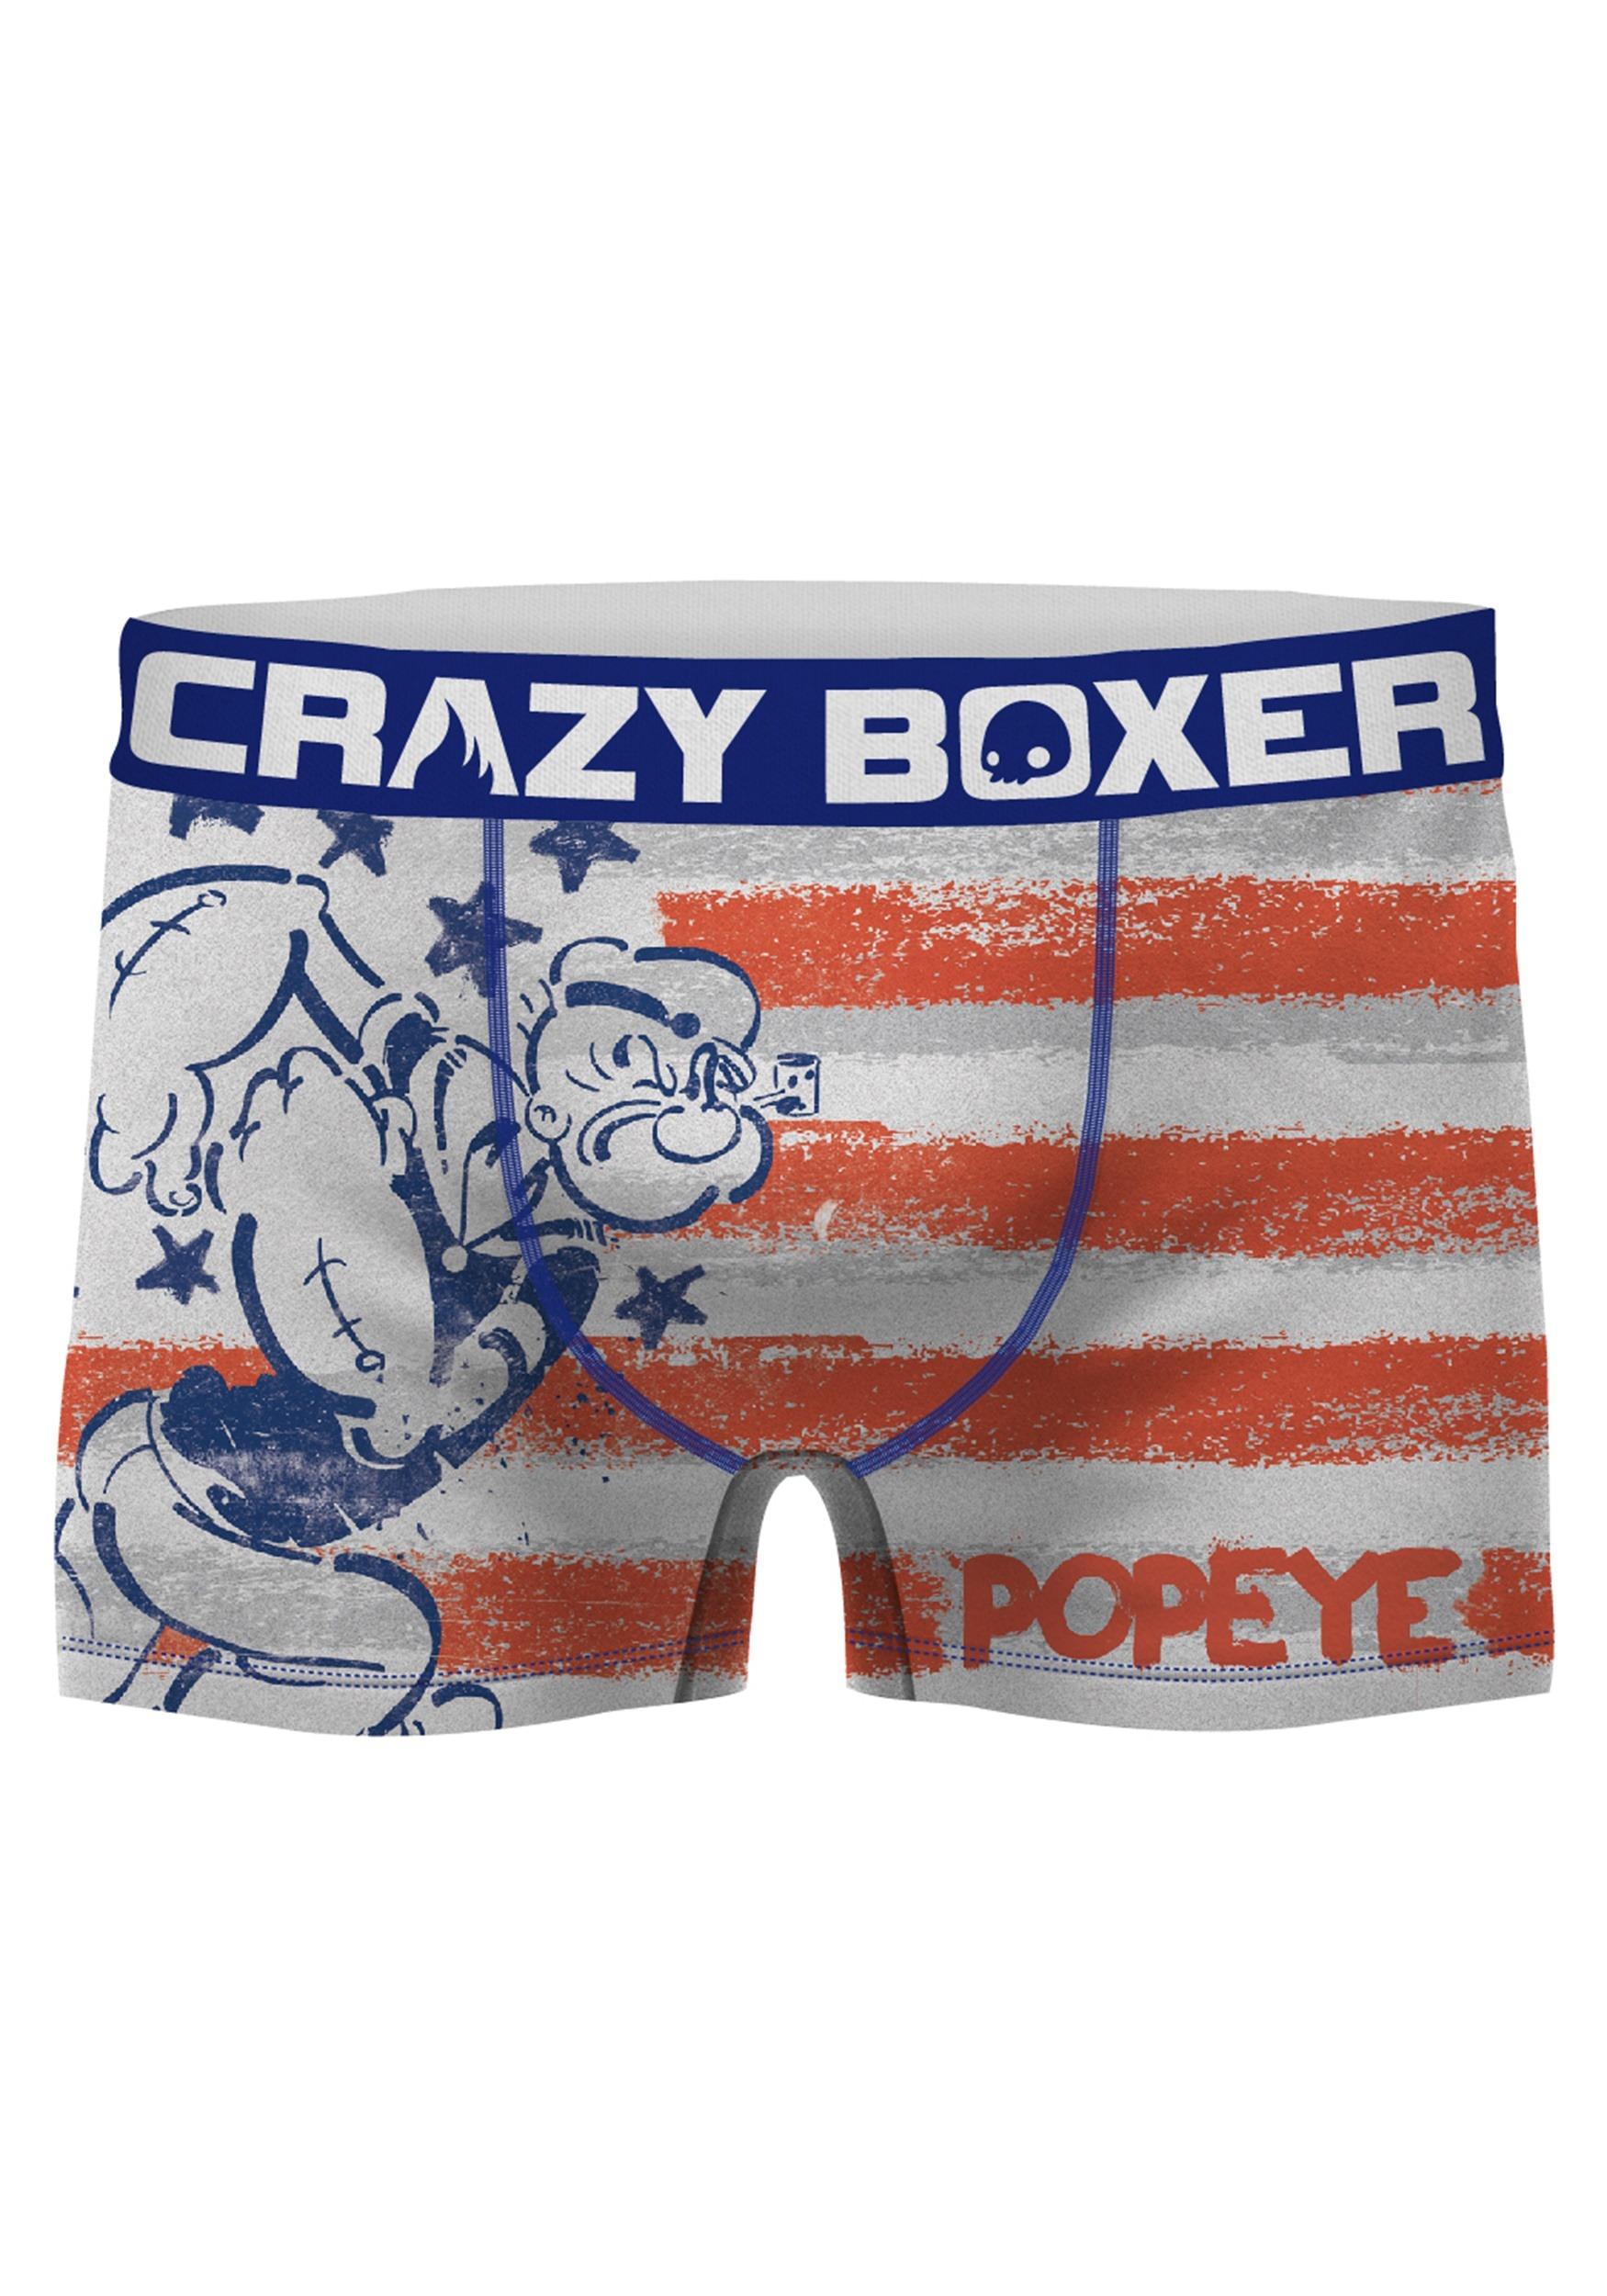 bd5c089709ce Crazy Boxers Men's Popeye American Flag Boxer Brief